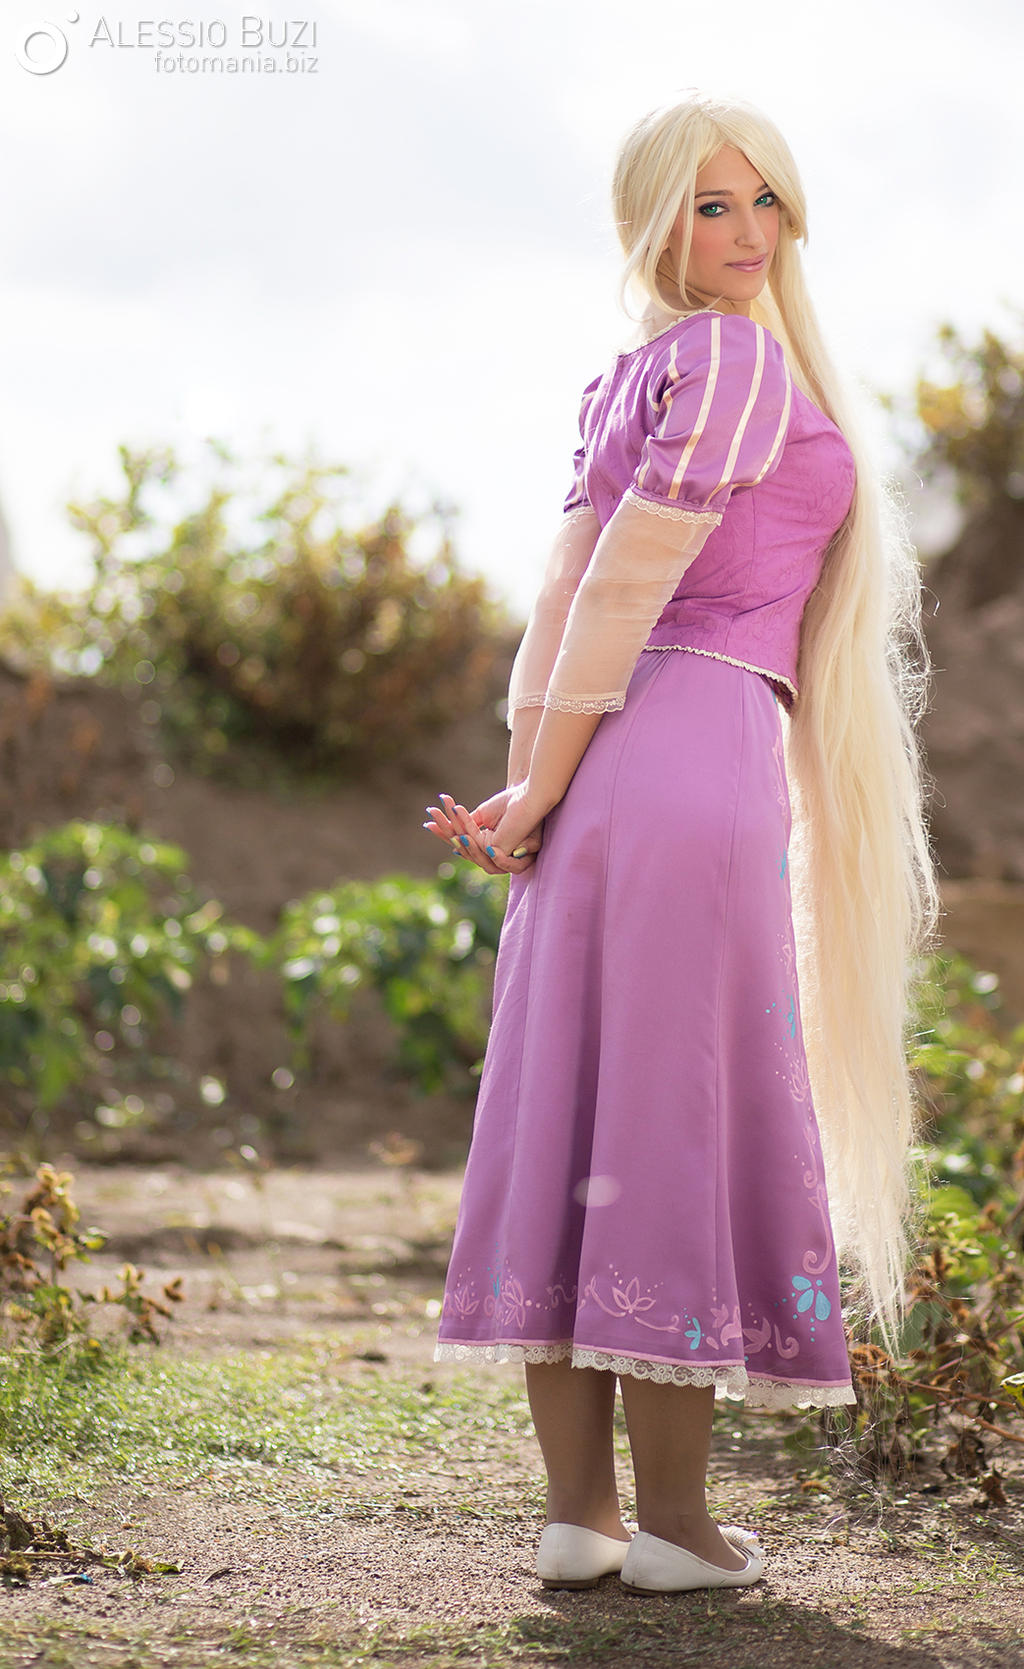 Rapunzel - Disney Princess cosplay by GiorgiaSanny on ...